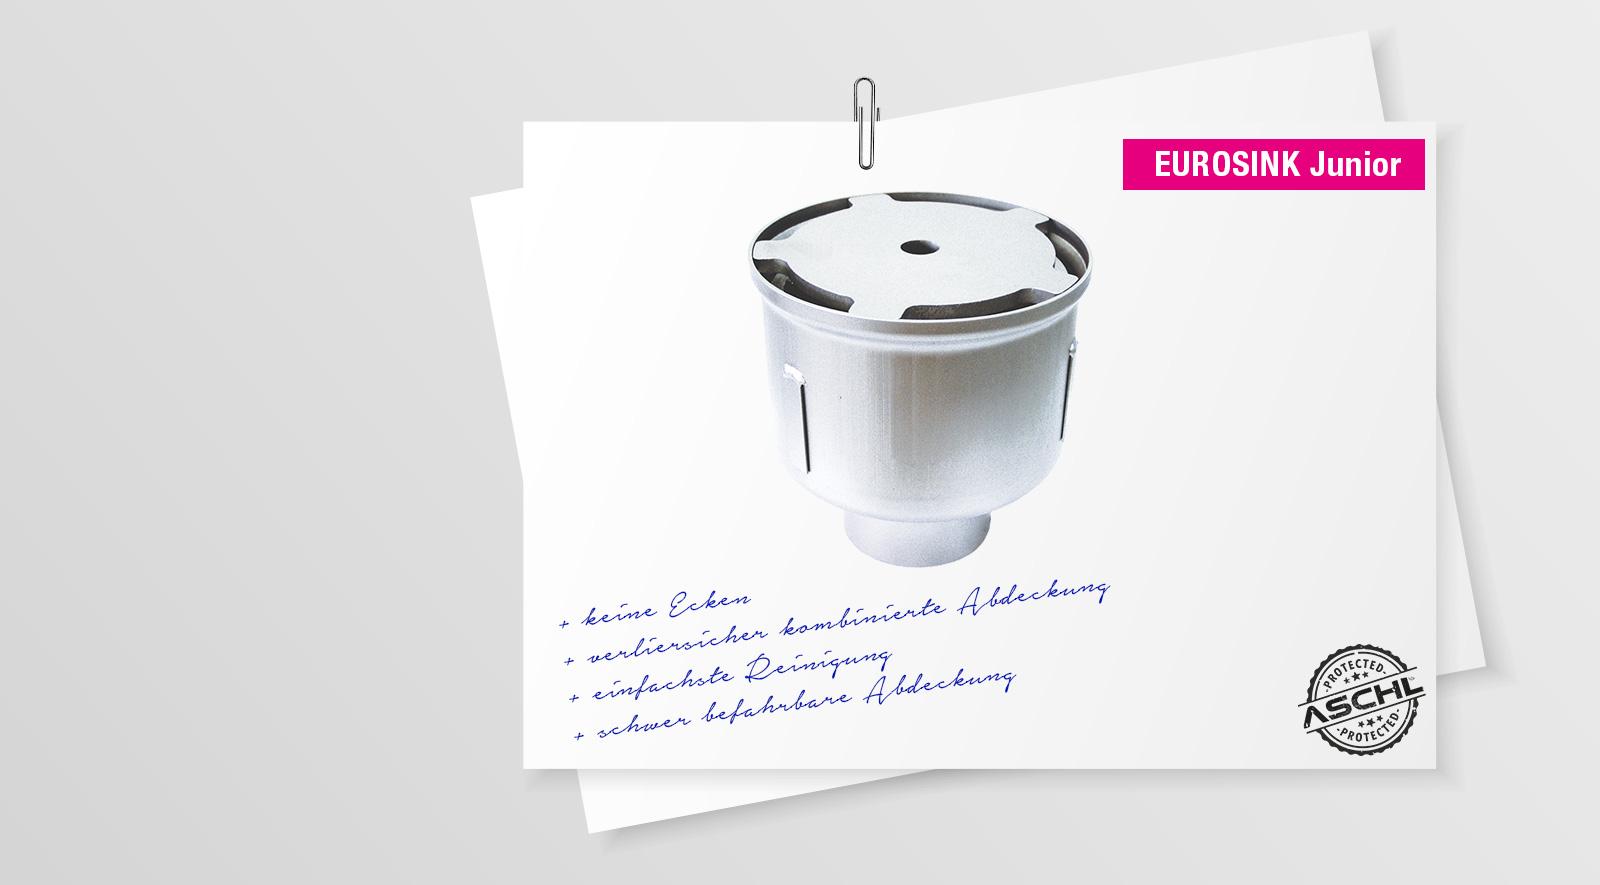 Eurosink Junior